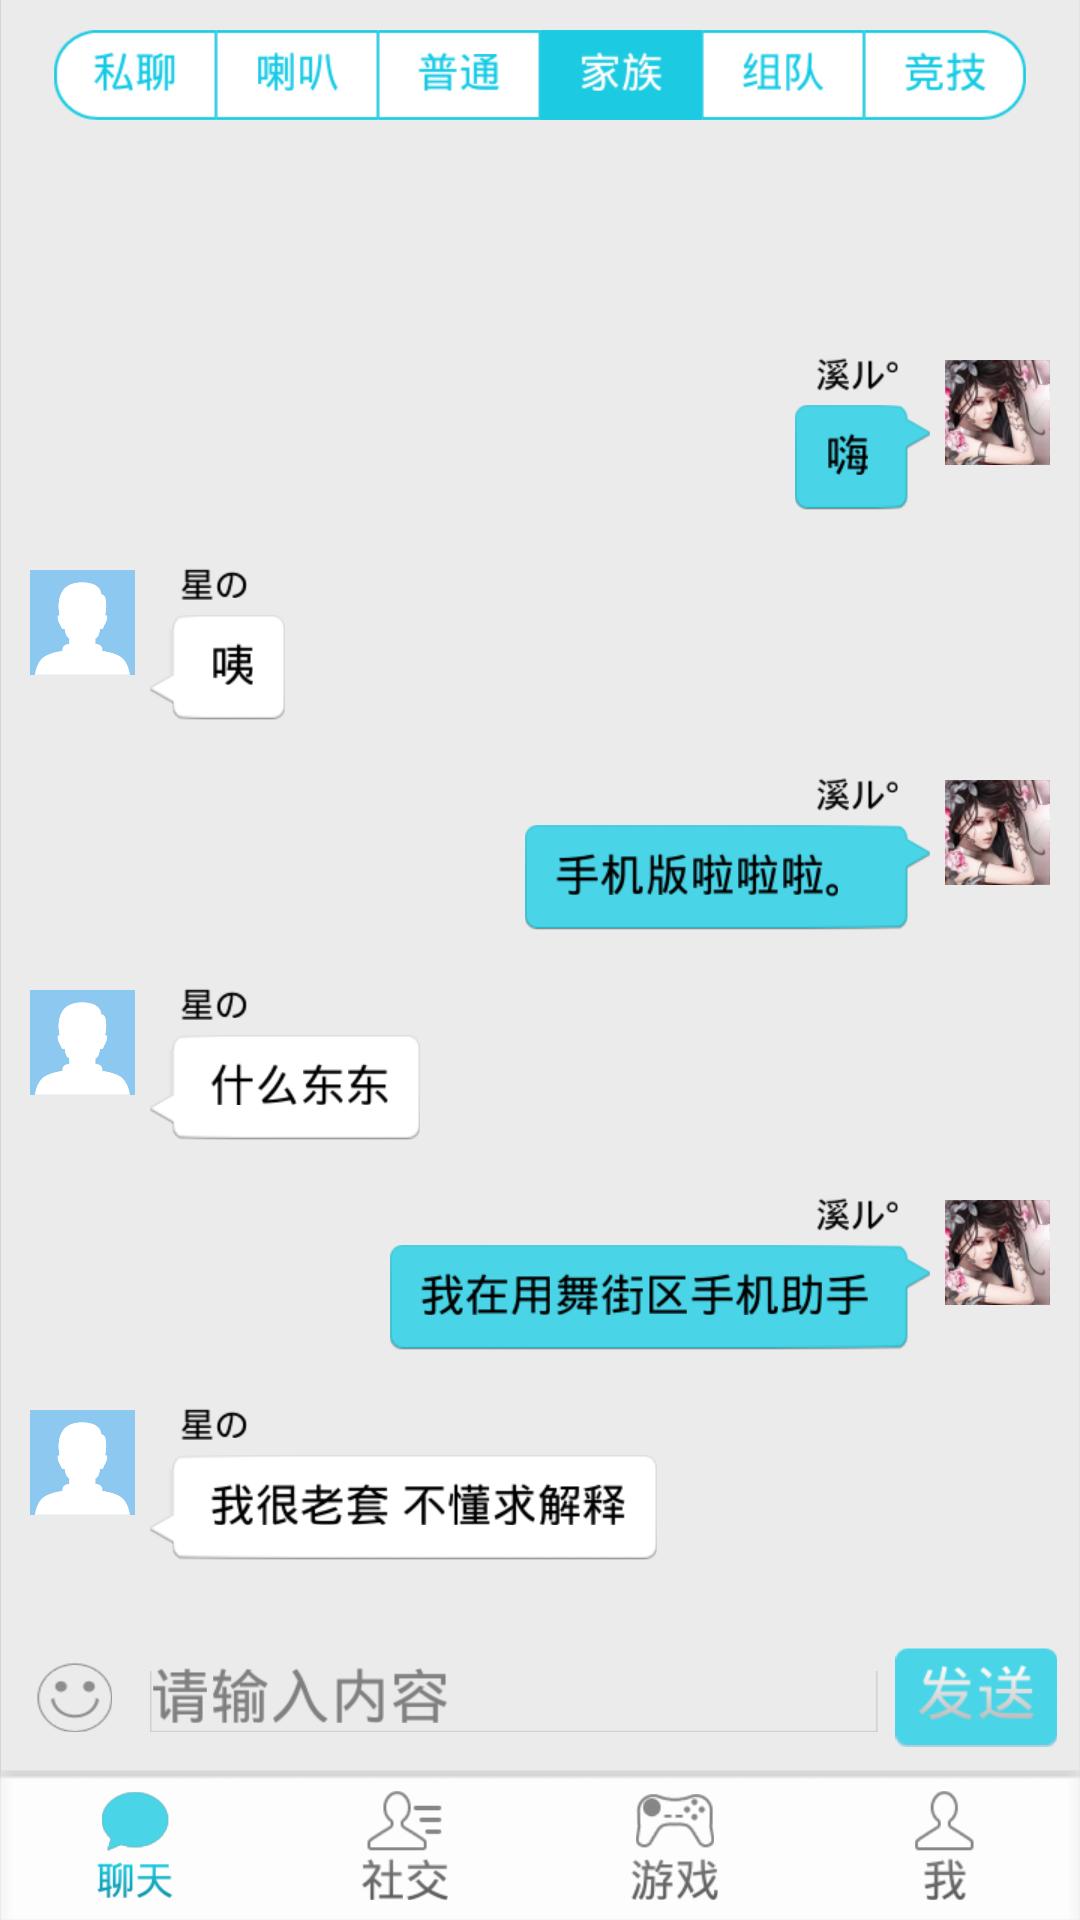 Screenshot_2015-09-23-16-39-04.png